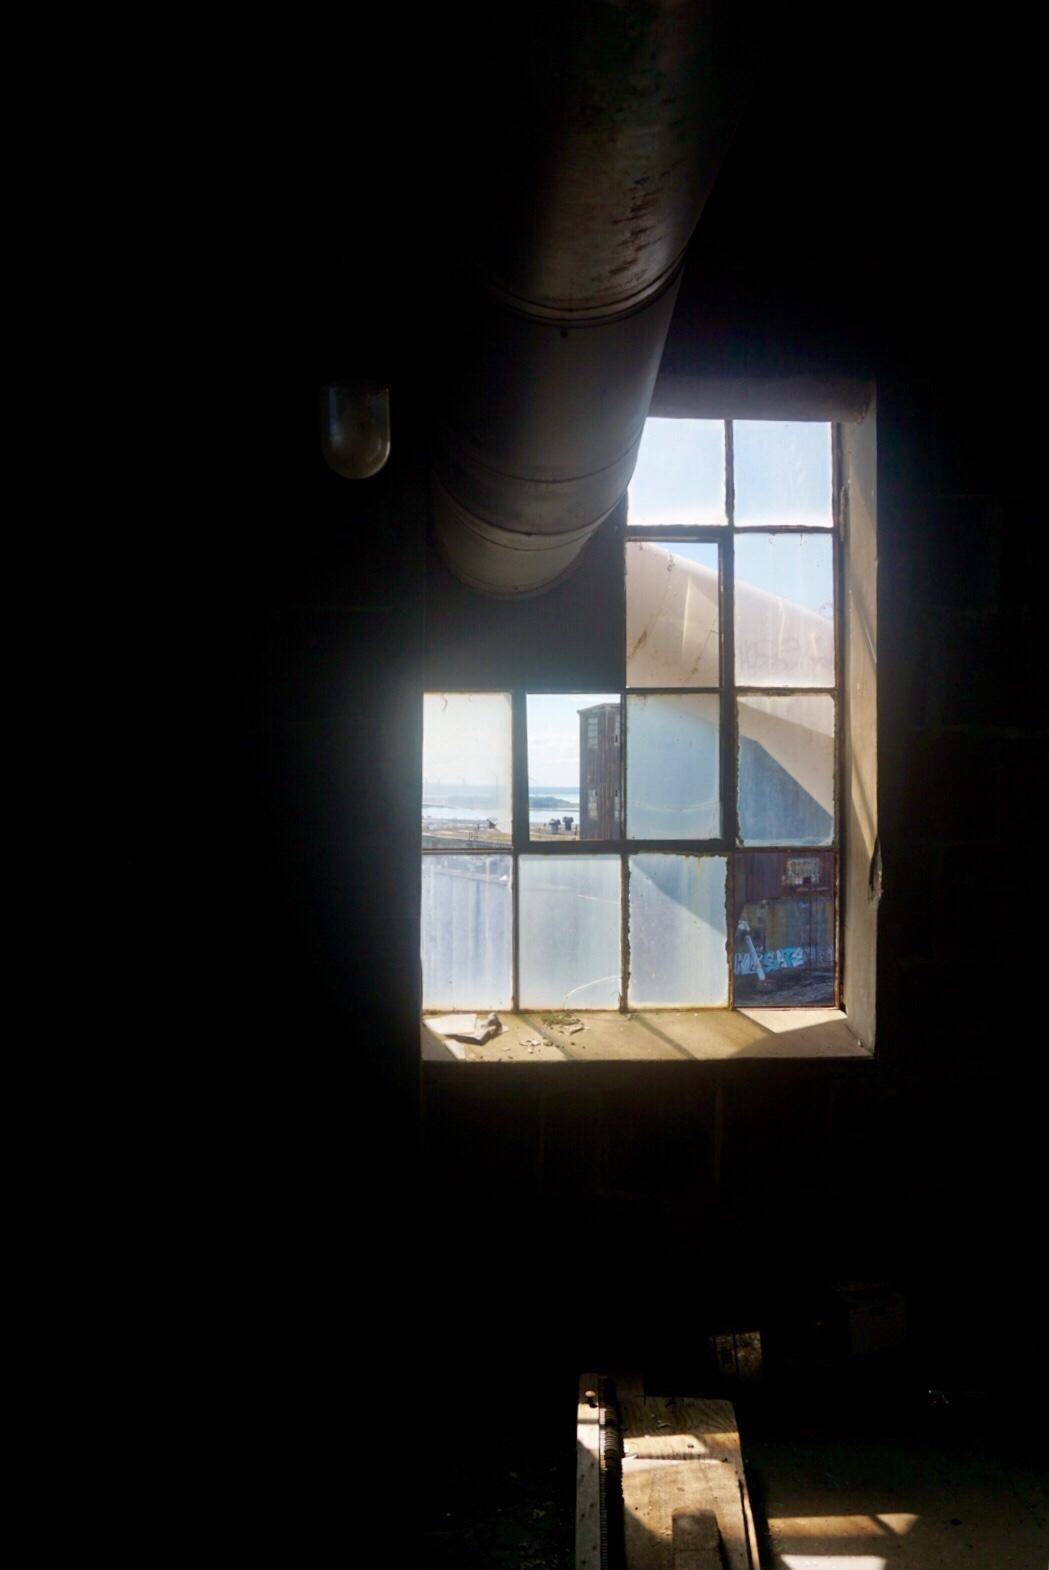 Old windows in Grain Silo in Buffalo